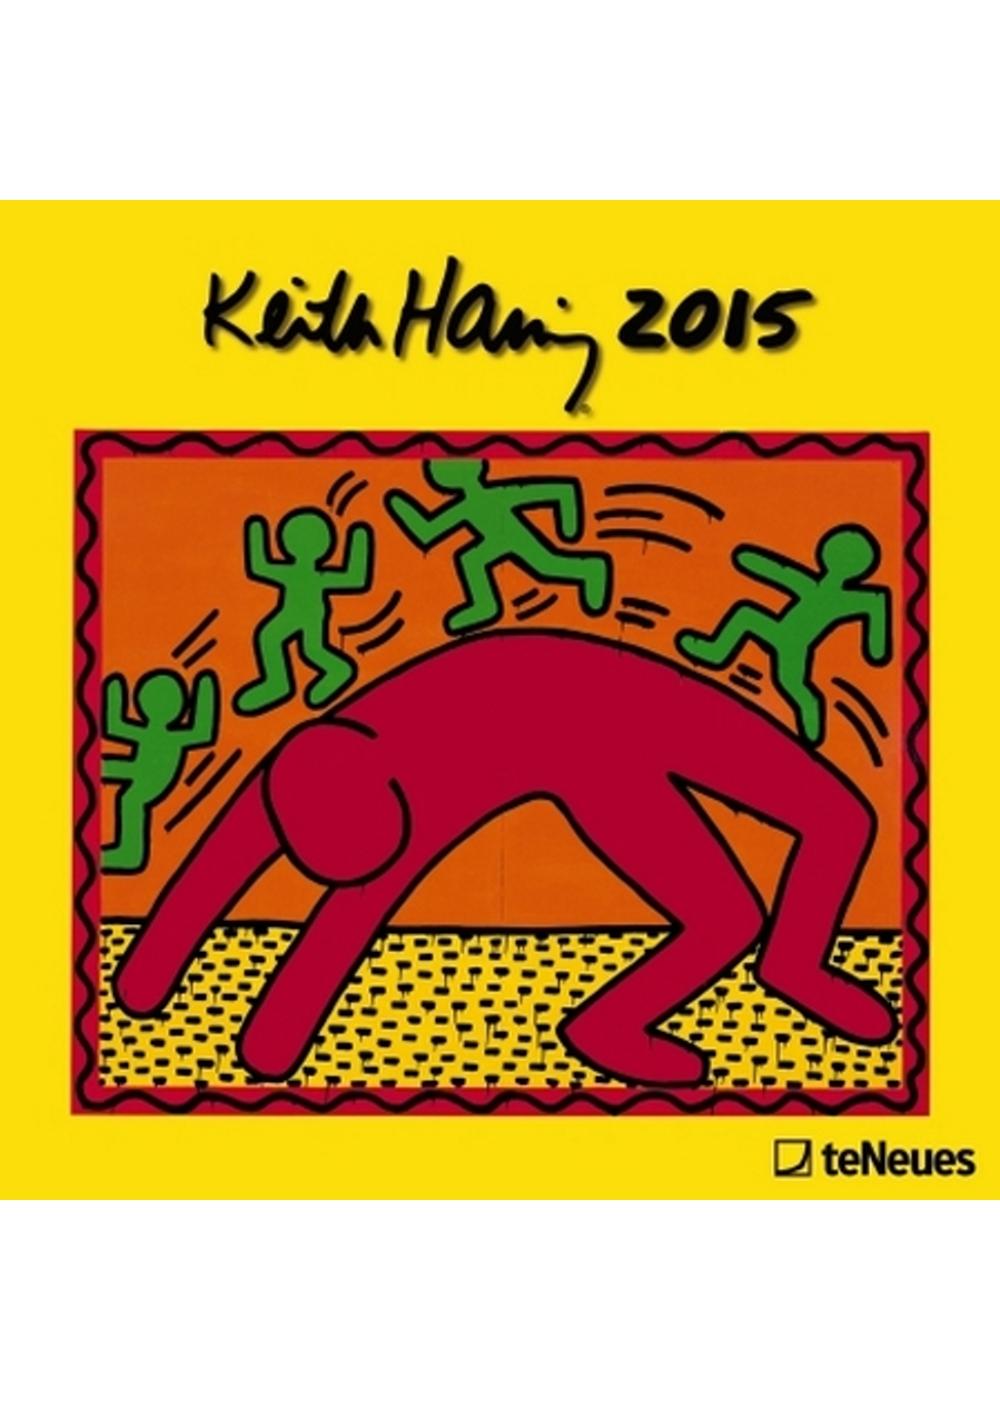 Keith Haring Calendar 2015